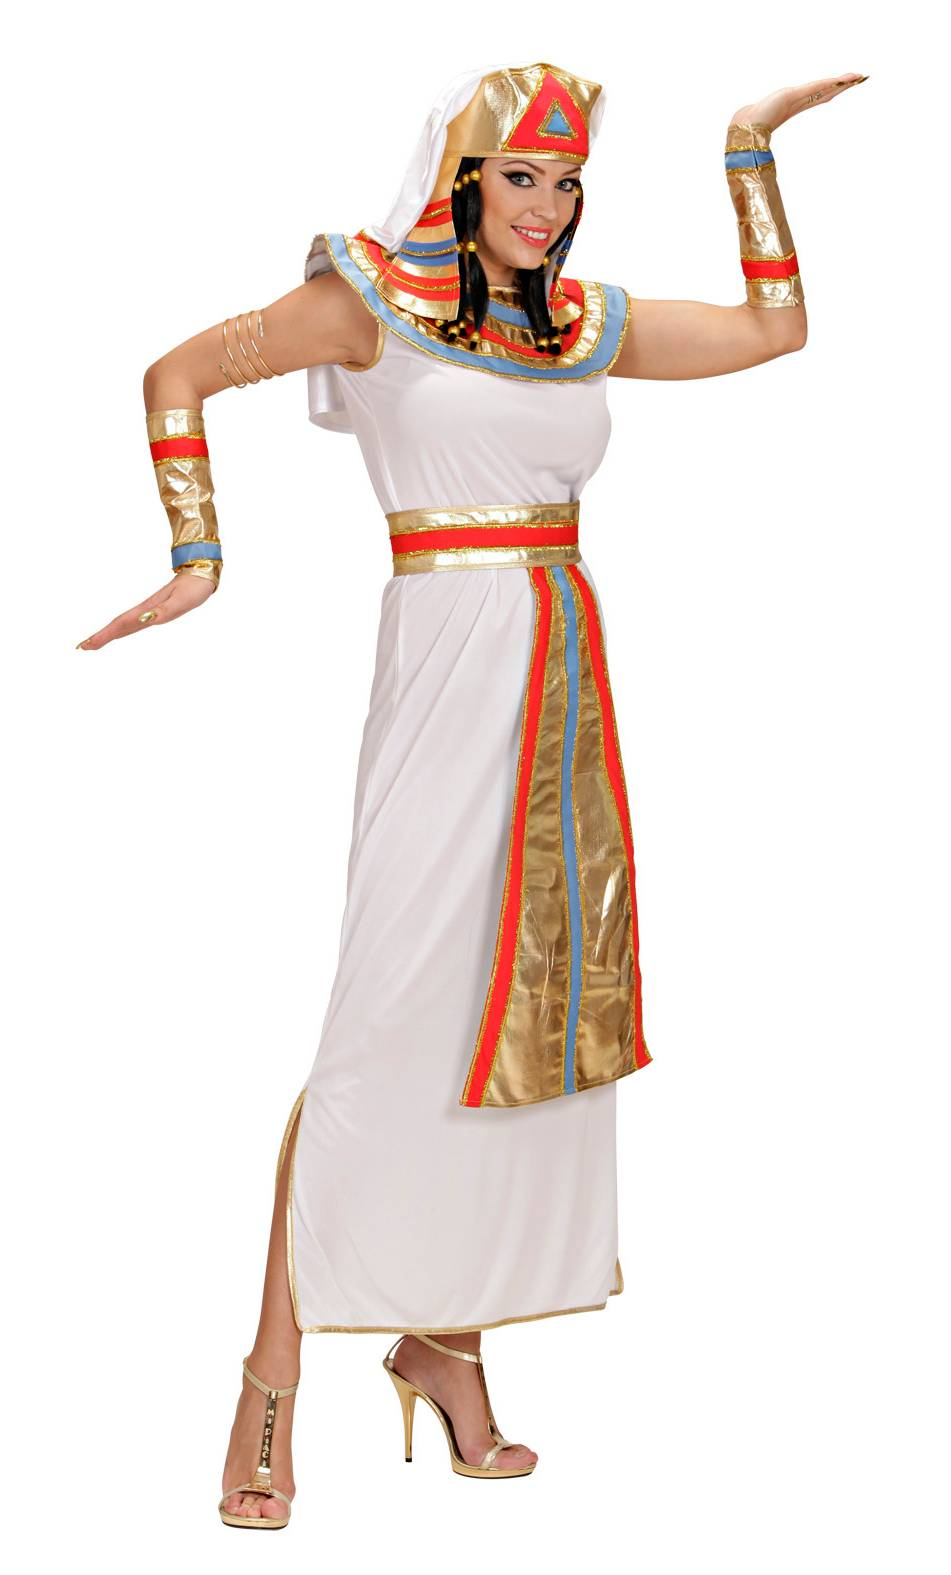 Costume-Egyptienne-Reine-du-Nil-2